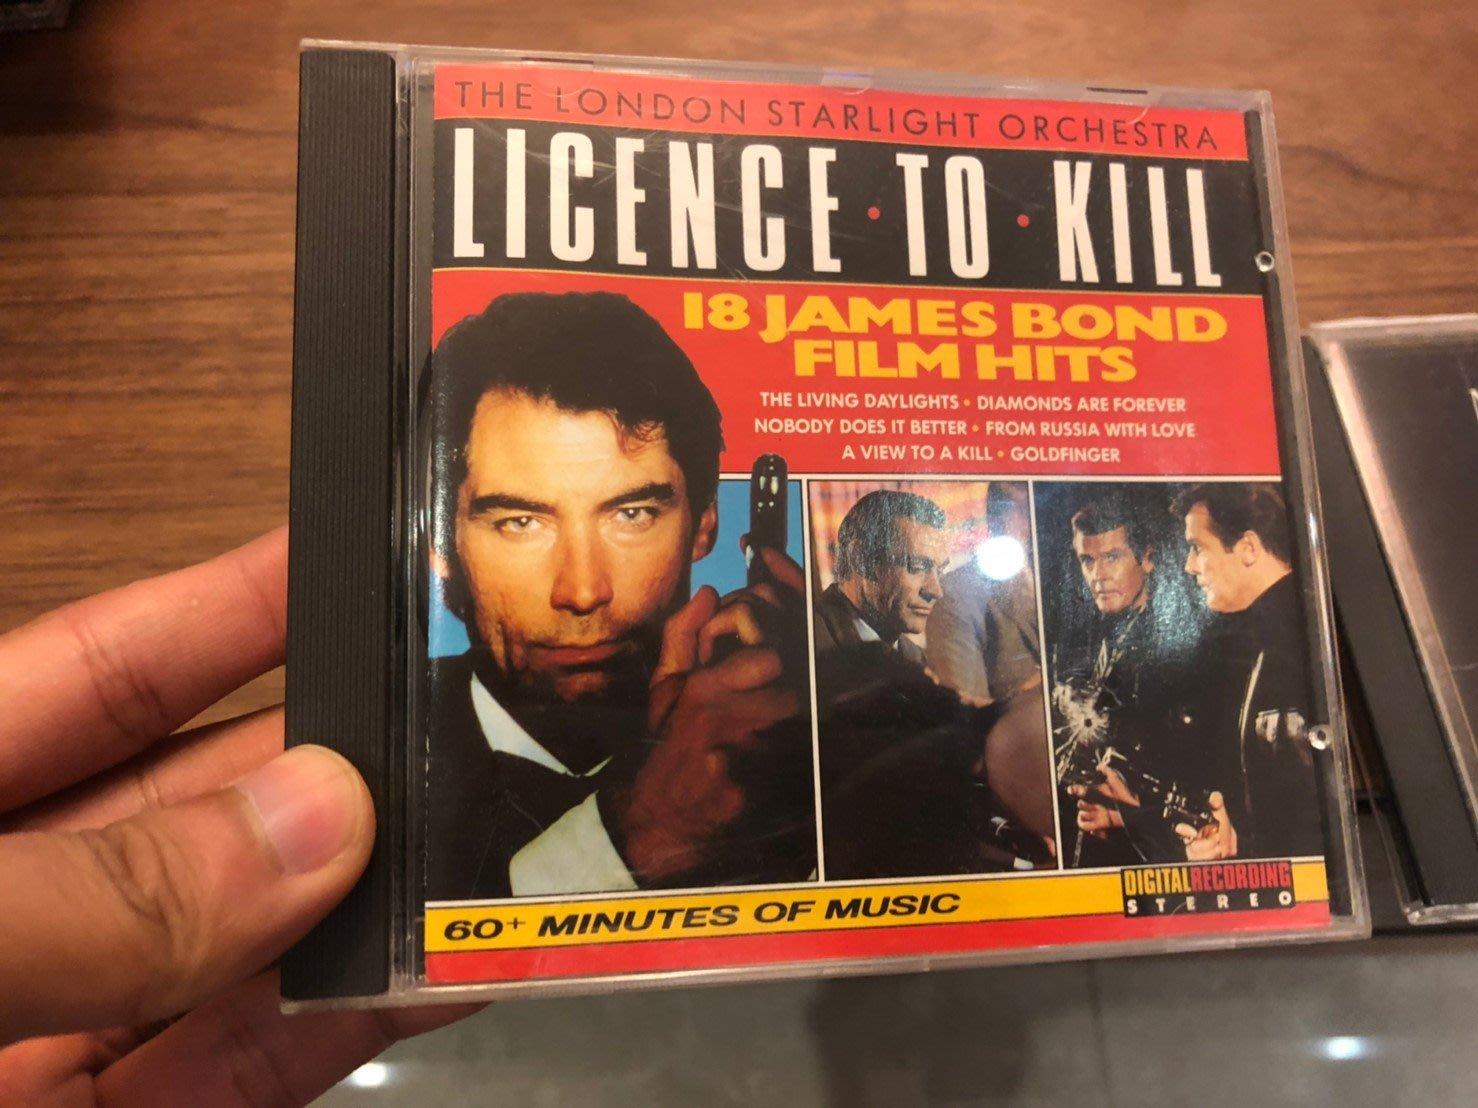 LICENCE TO KILL 18 JAMES BOND FILM HIT 無刮痕 cd